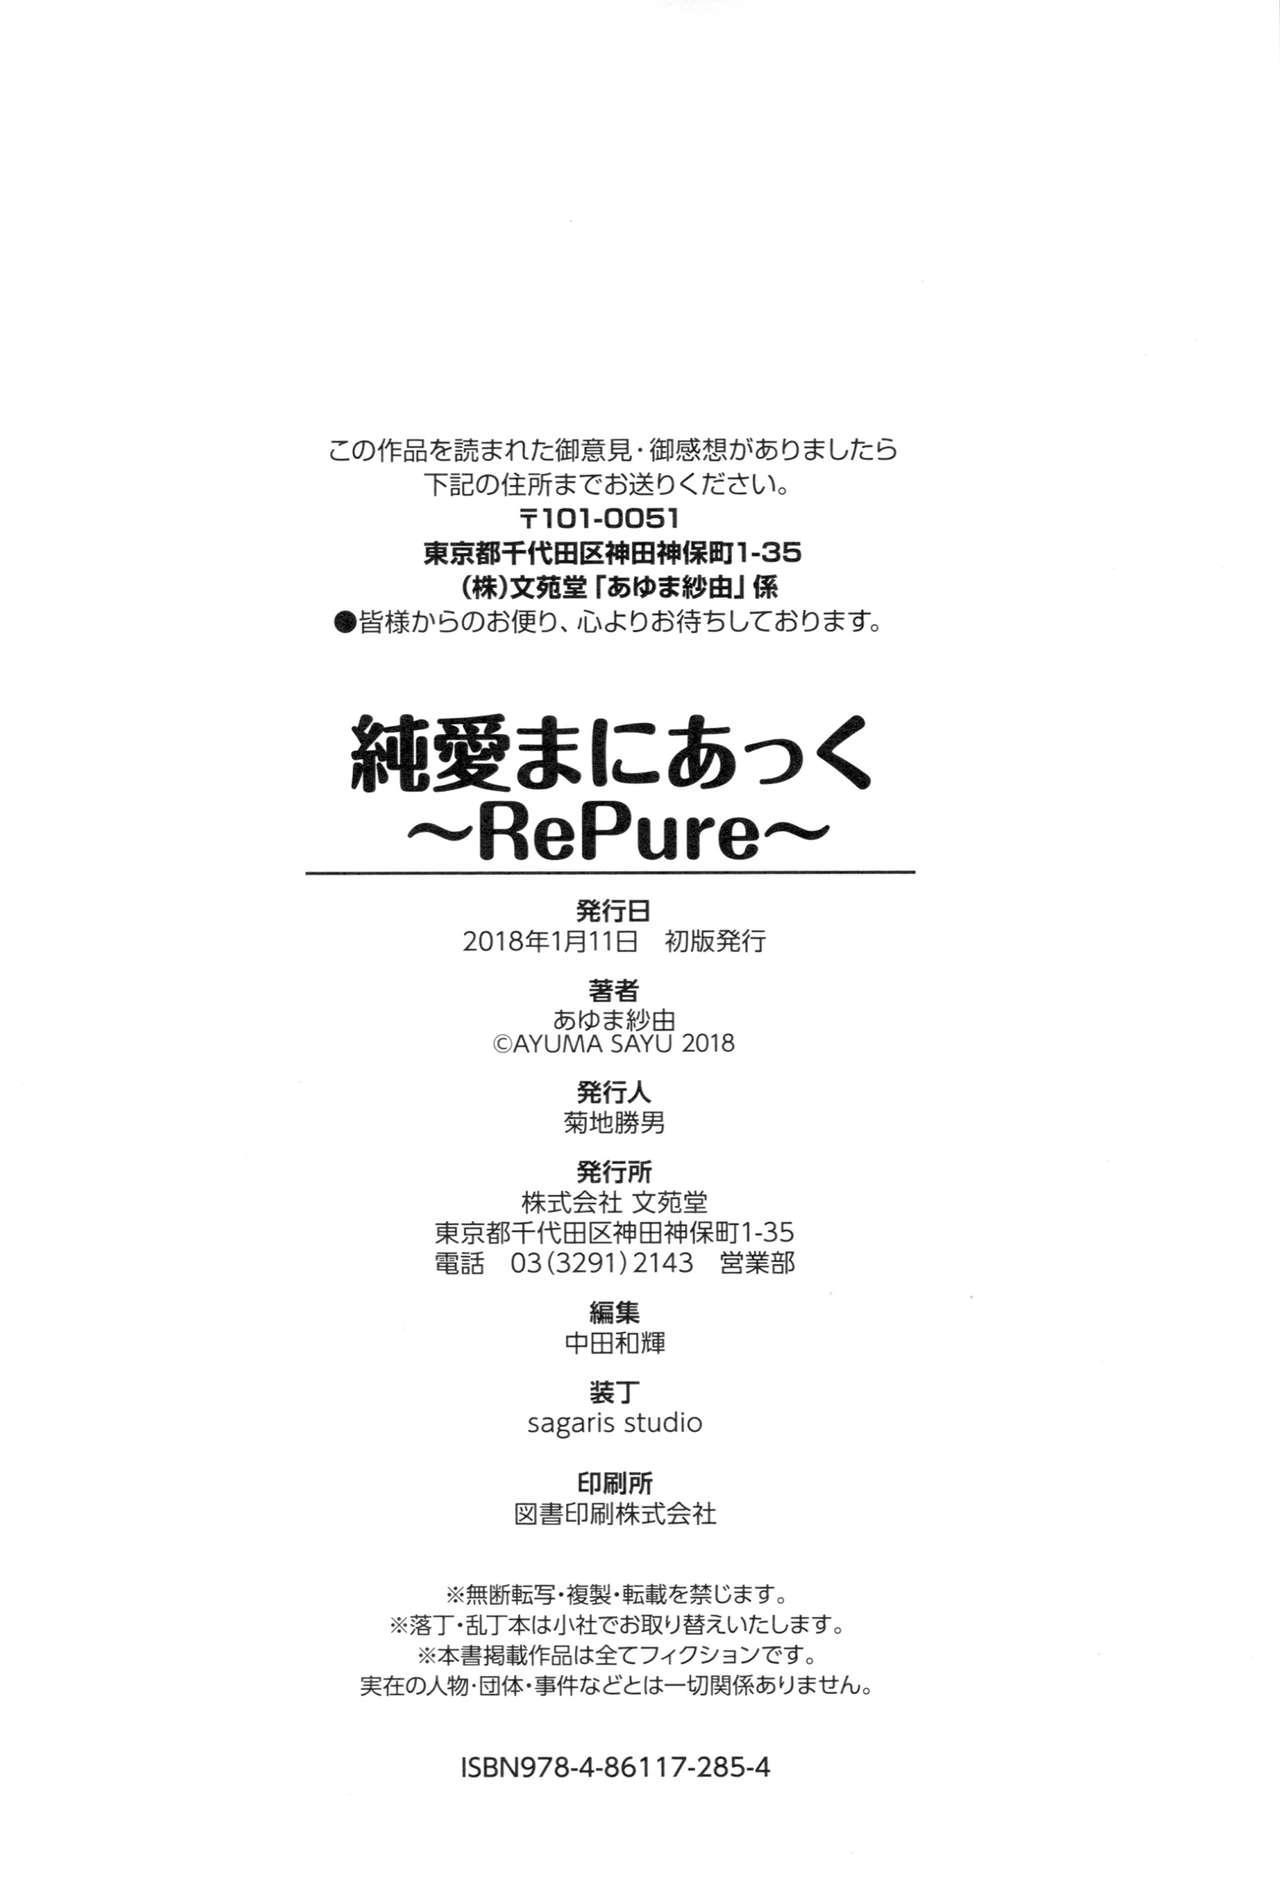 [Ayuma Sayu] Junai Maniac ~RePure~ B2 Tapestry Tsuki Melon Books Genteiban 217